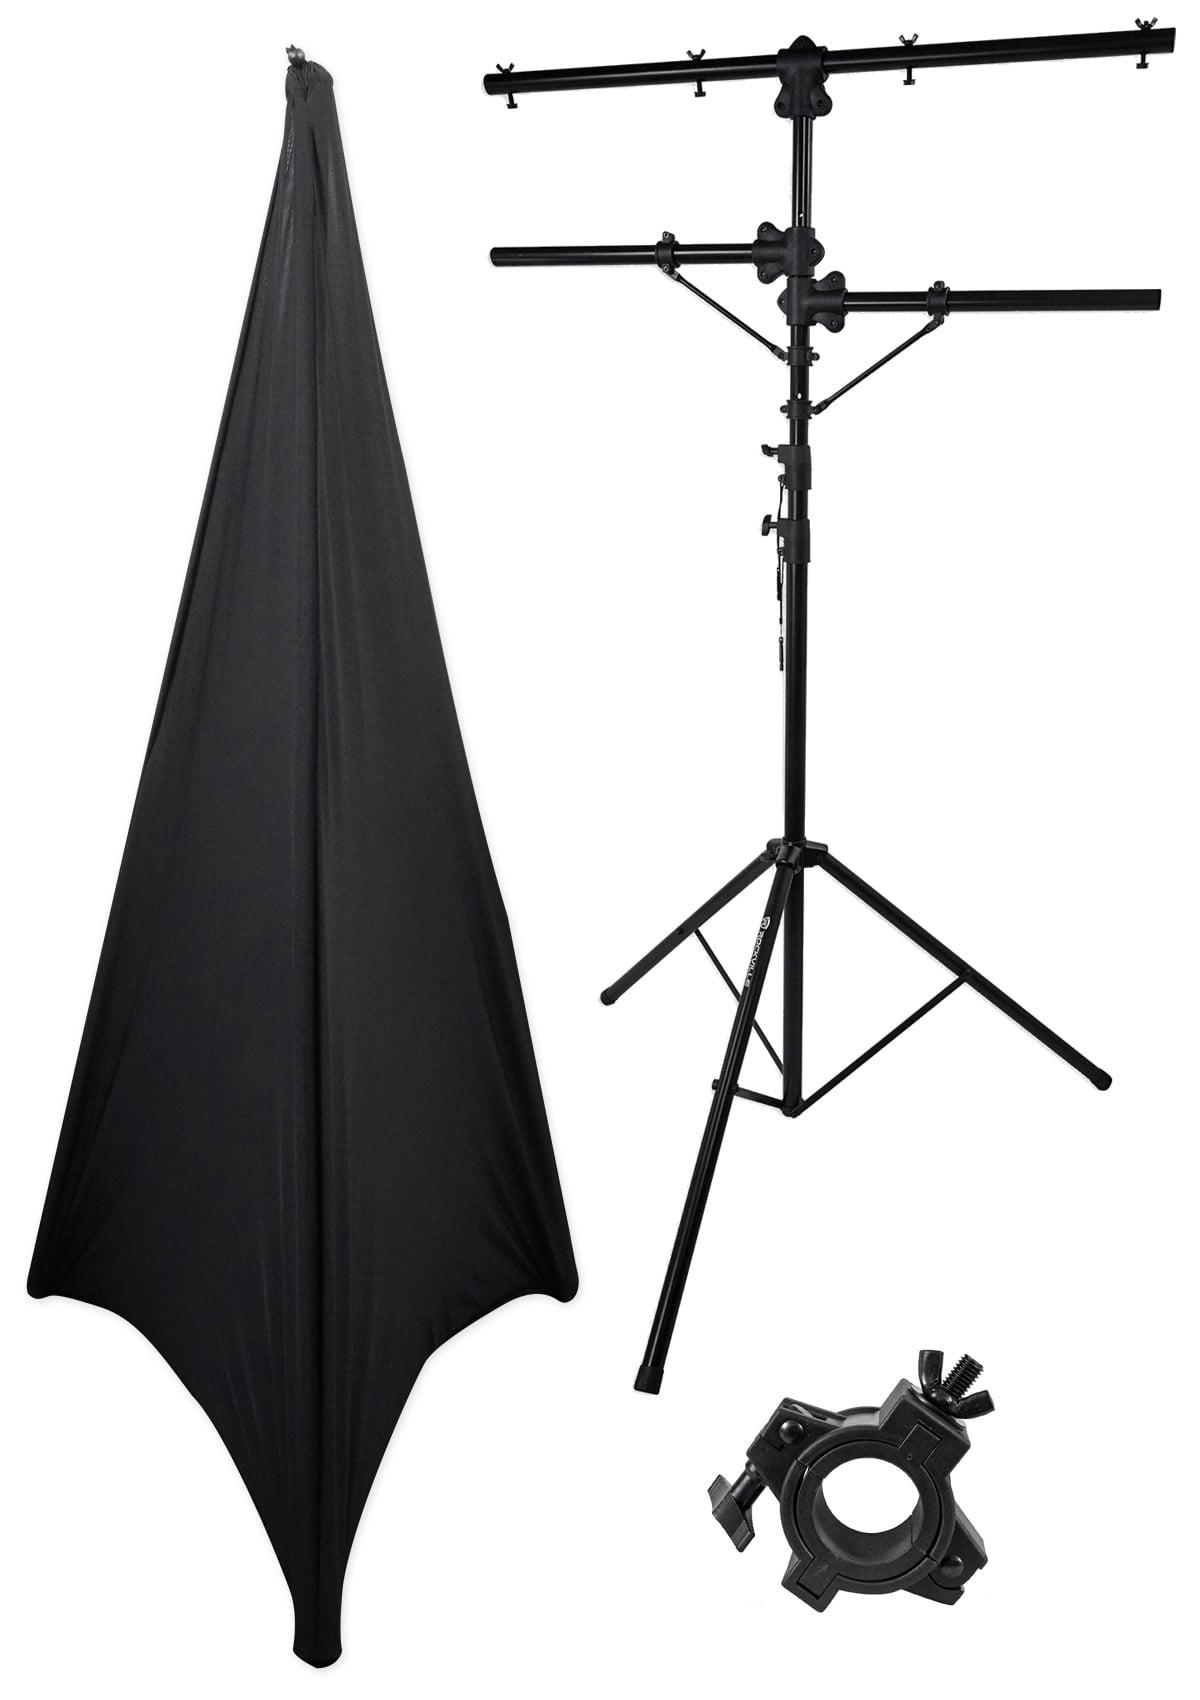 Rockville RVLS1 Lighting Tree Light Stand + Scrim Werks Black Cloth Cover by ROCKVILLE